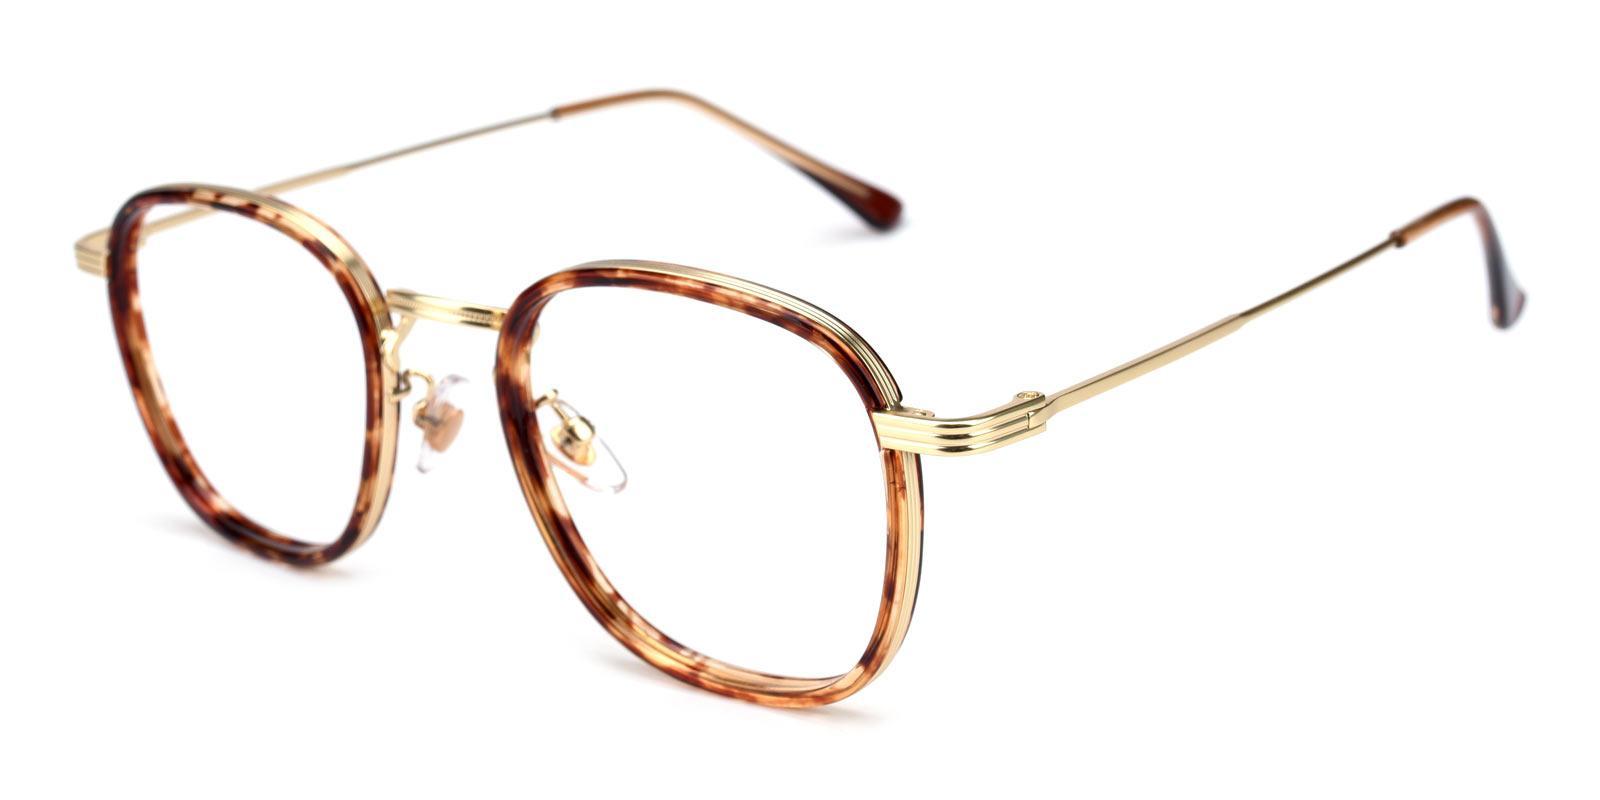 Genmai-Tortoise-Square-Metal-Eyeglasses-detail